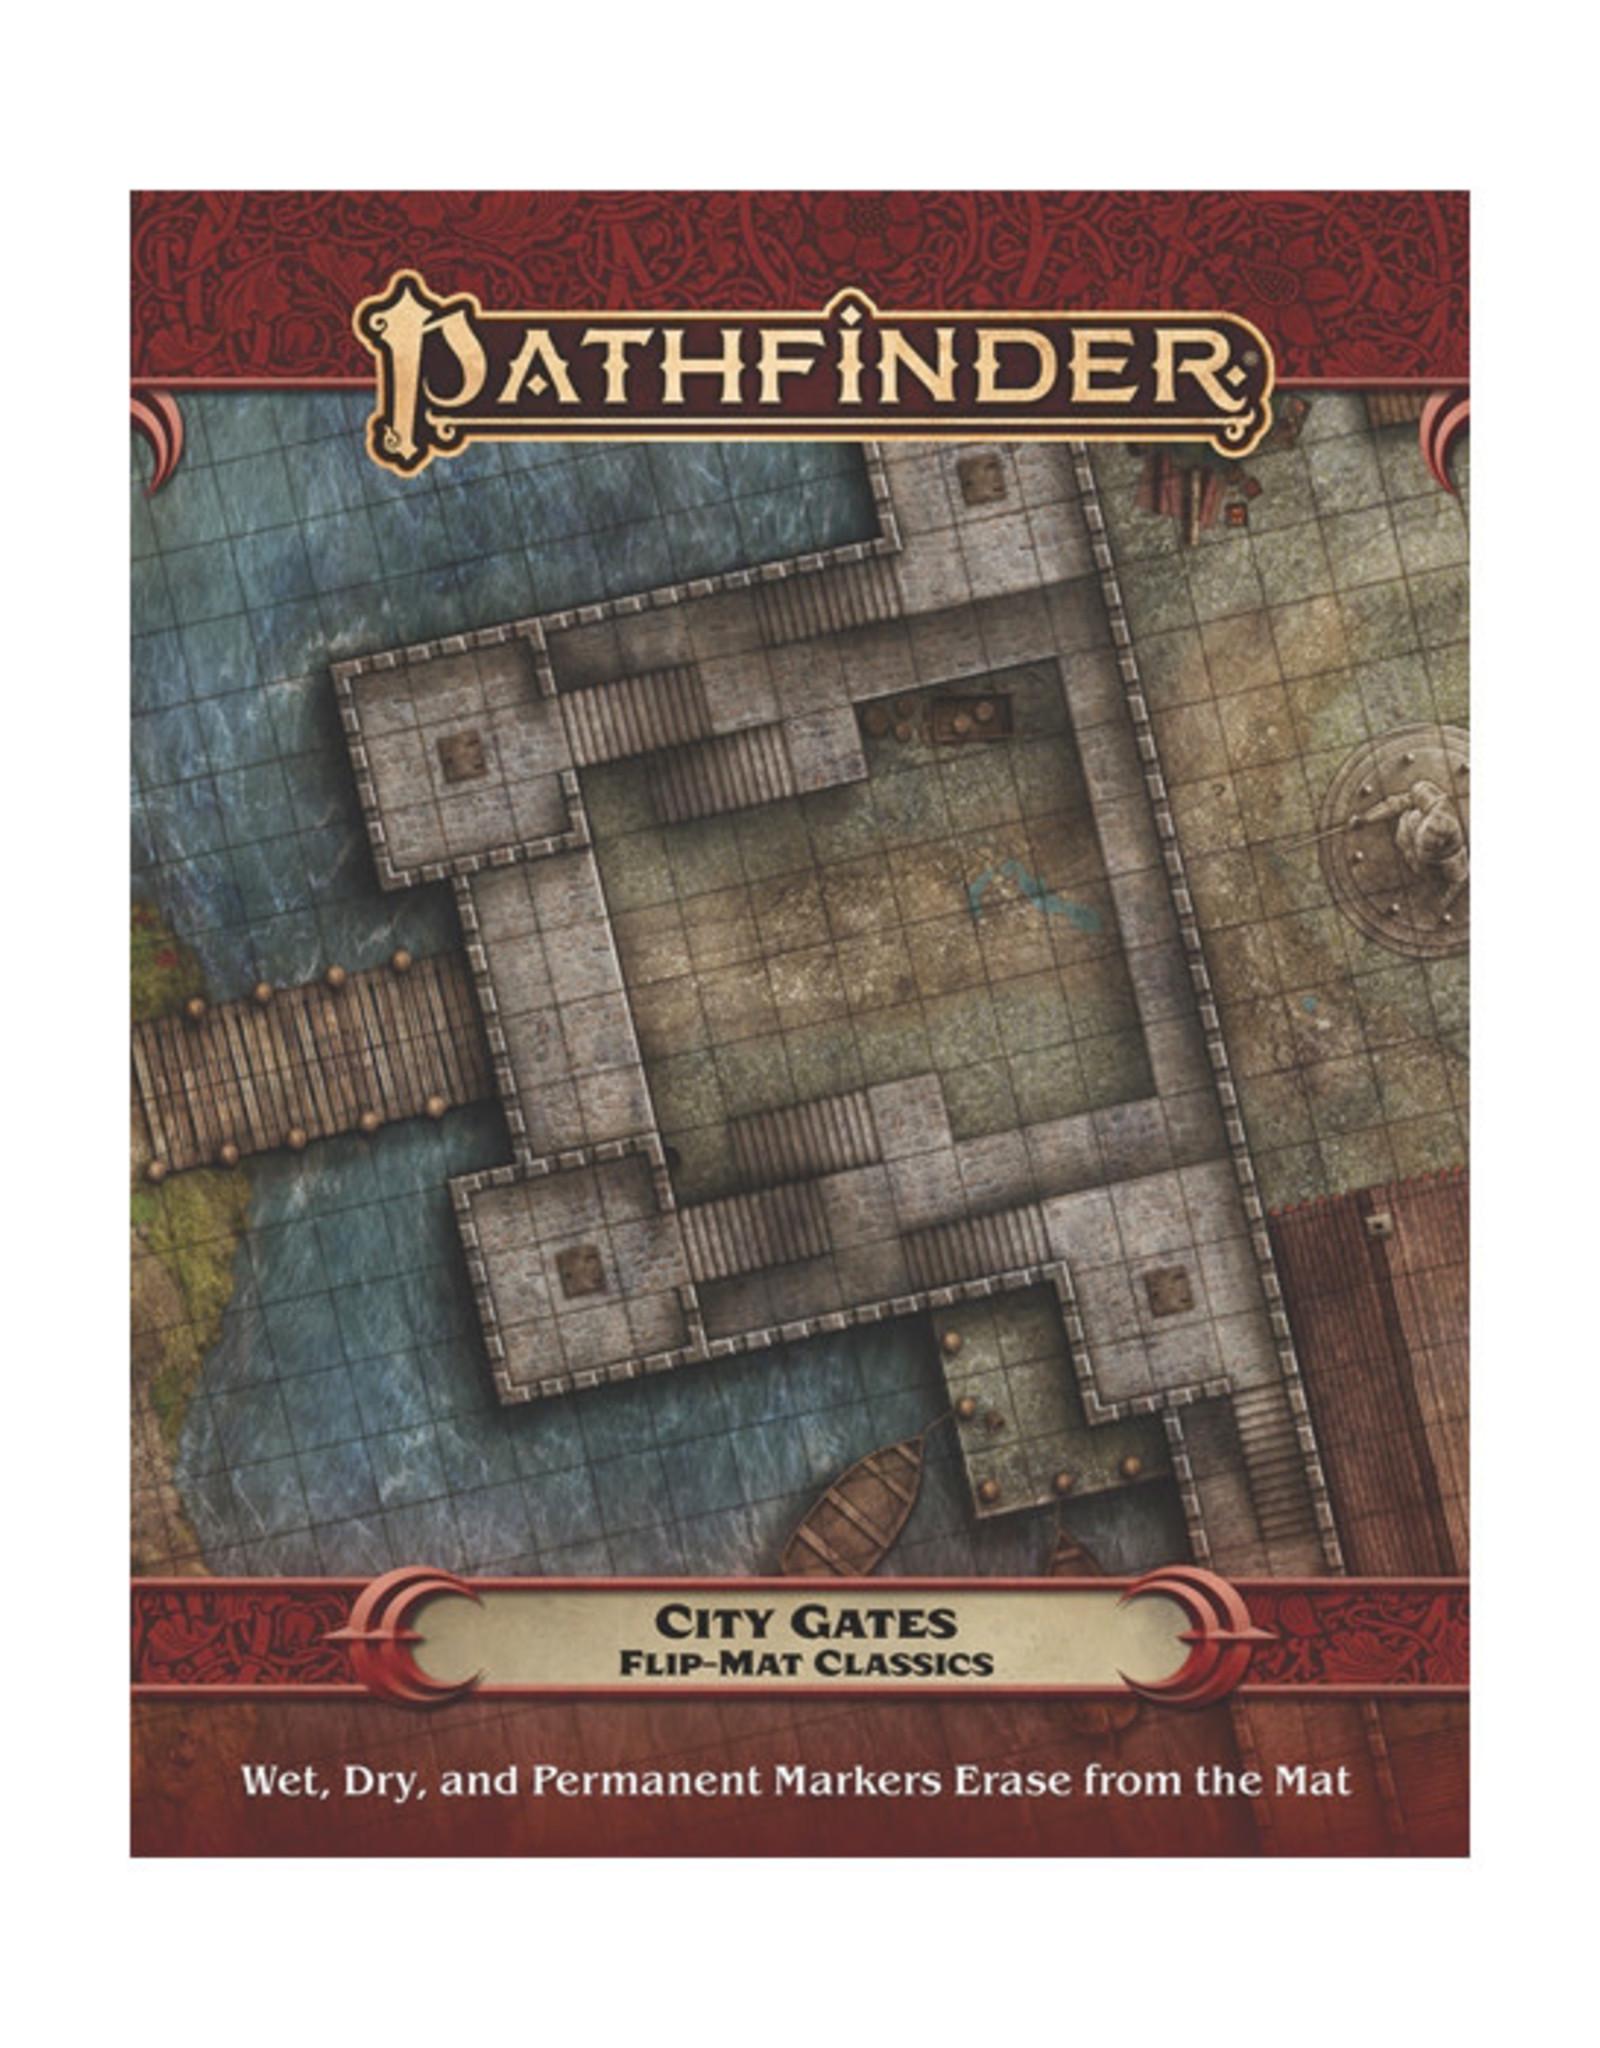 Pathfinder Pathfinder: Flip-Mat Classics - City Gates